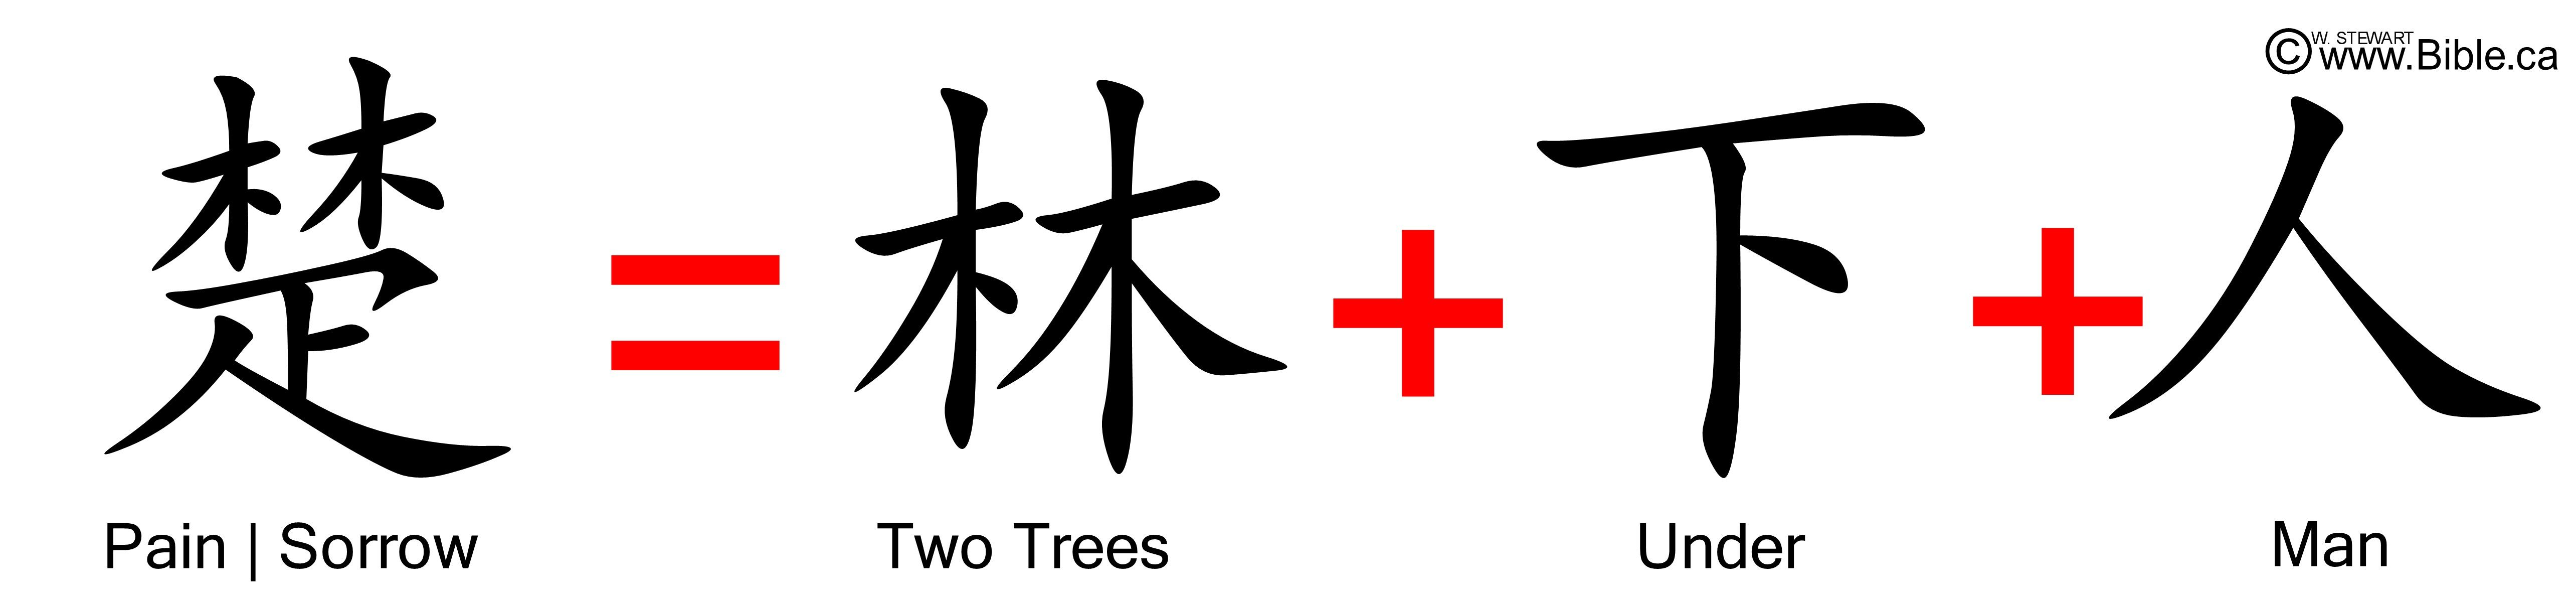 Pain sorrow chinese symbols art diys pinterest pain sorrow chinese symbols biocorpaavc Images